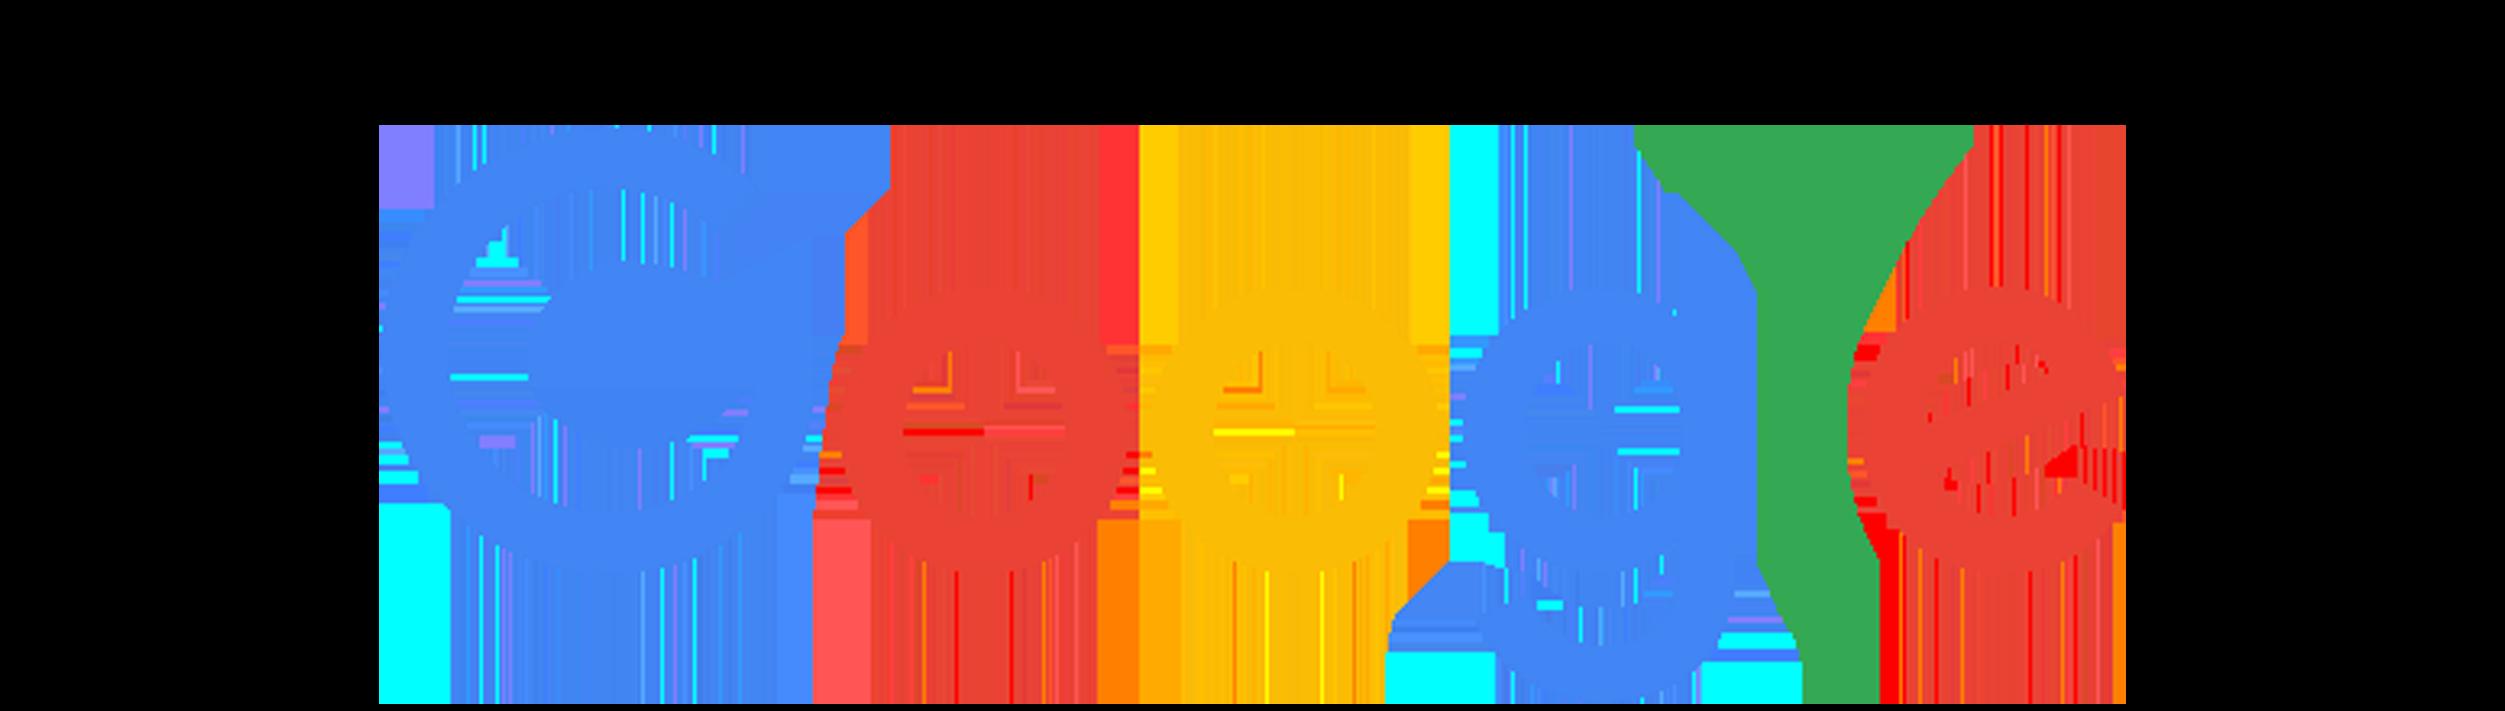 google analytics integration for customer tracking